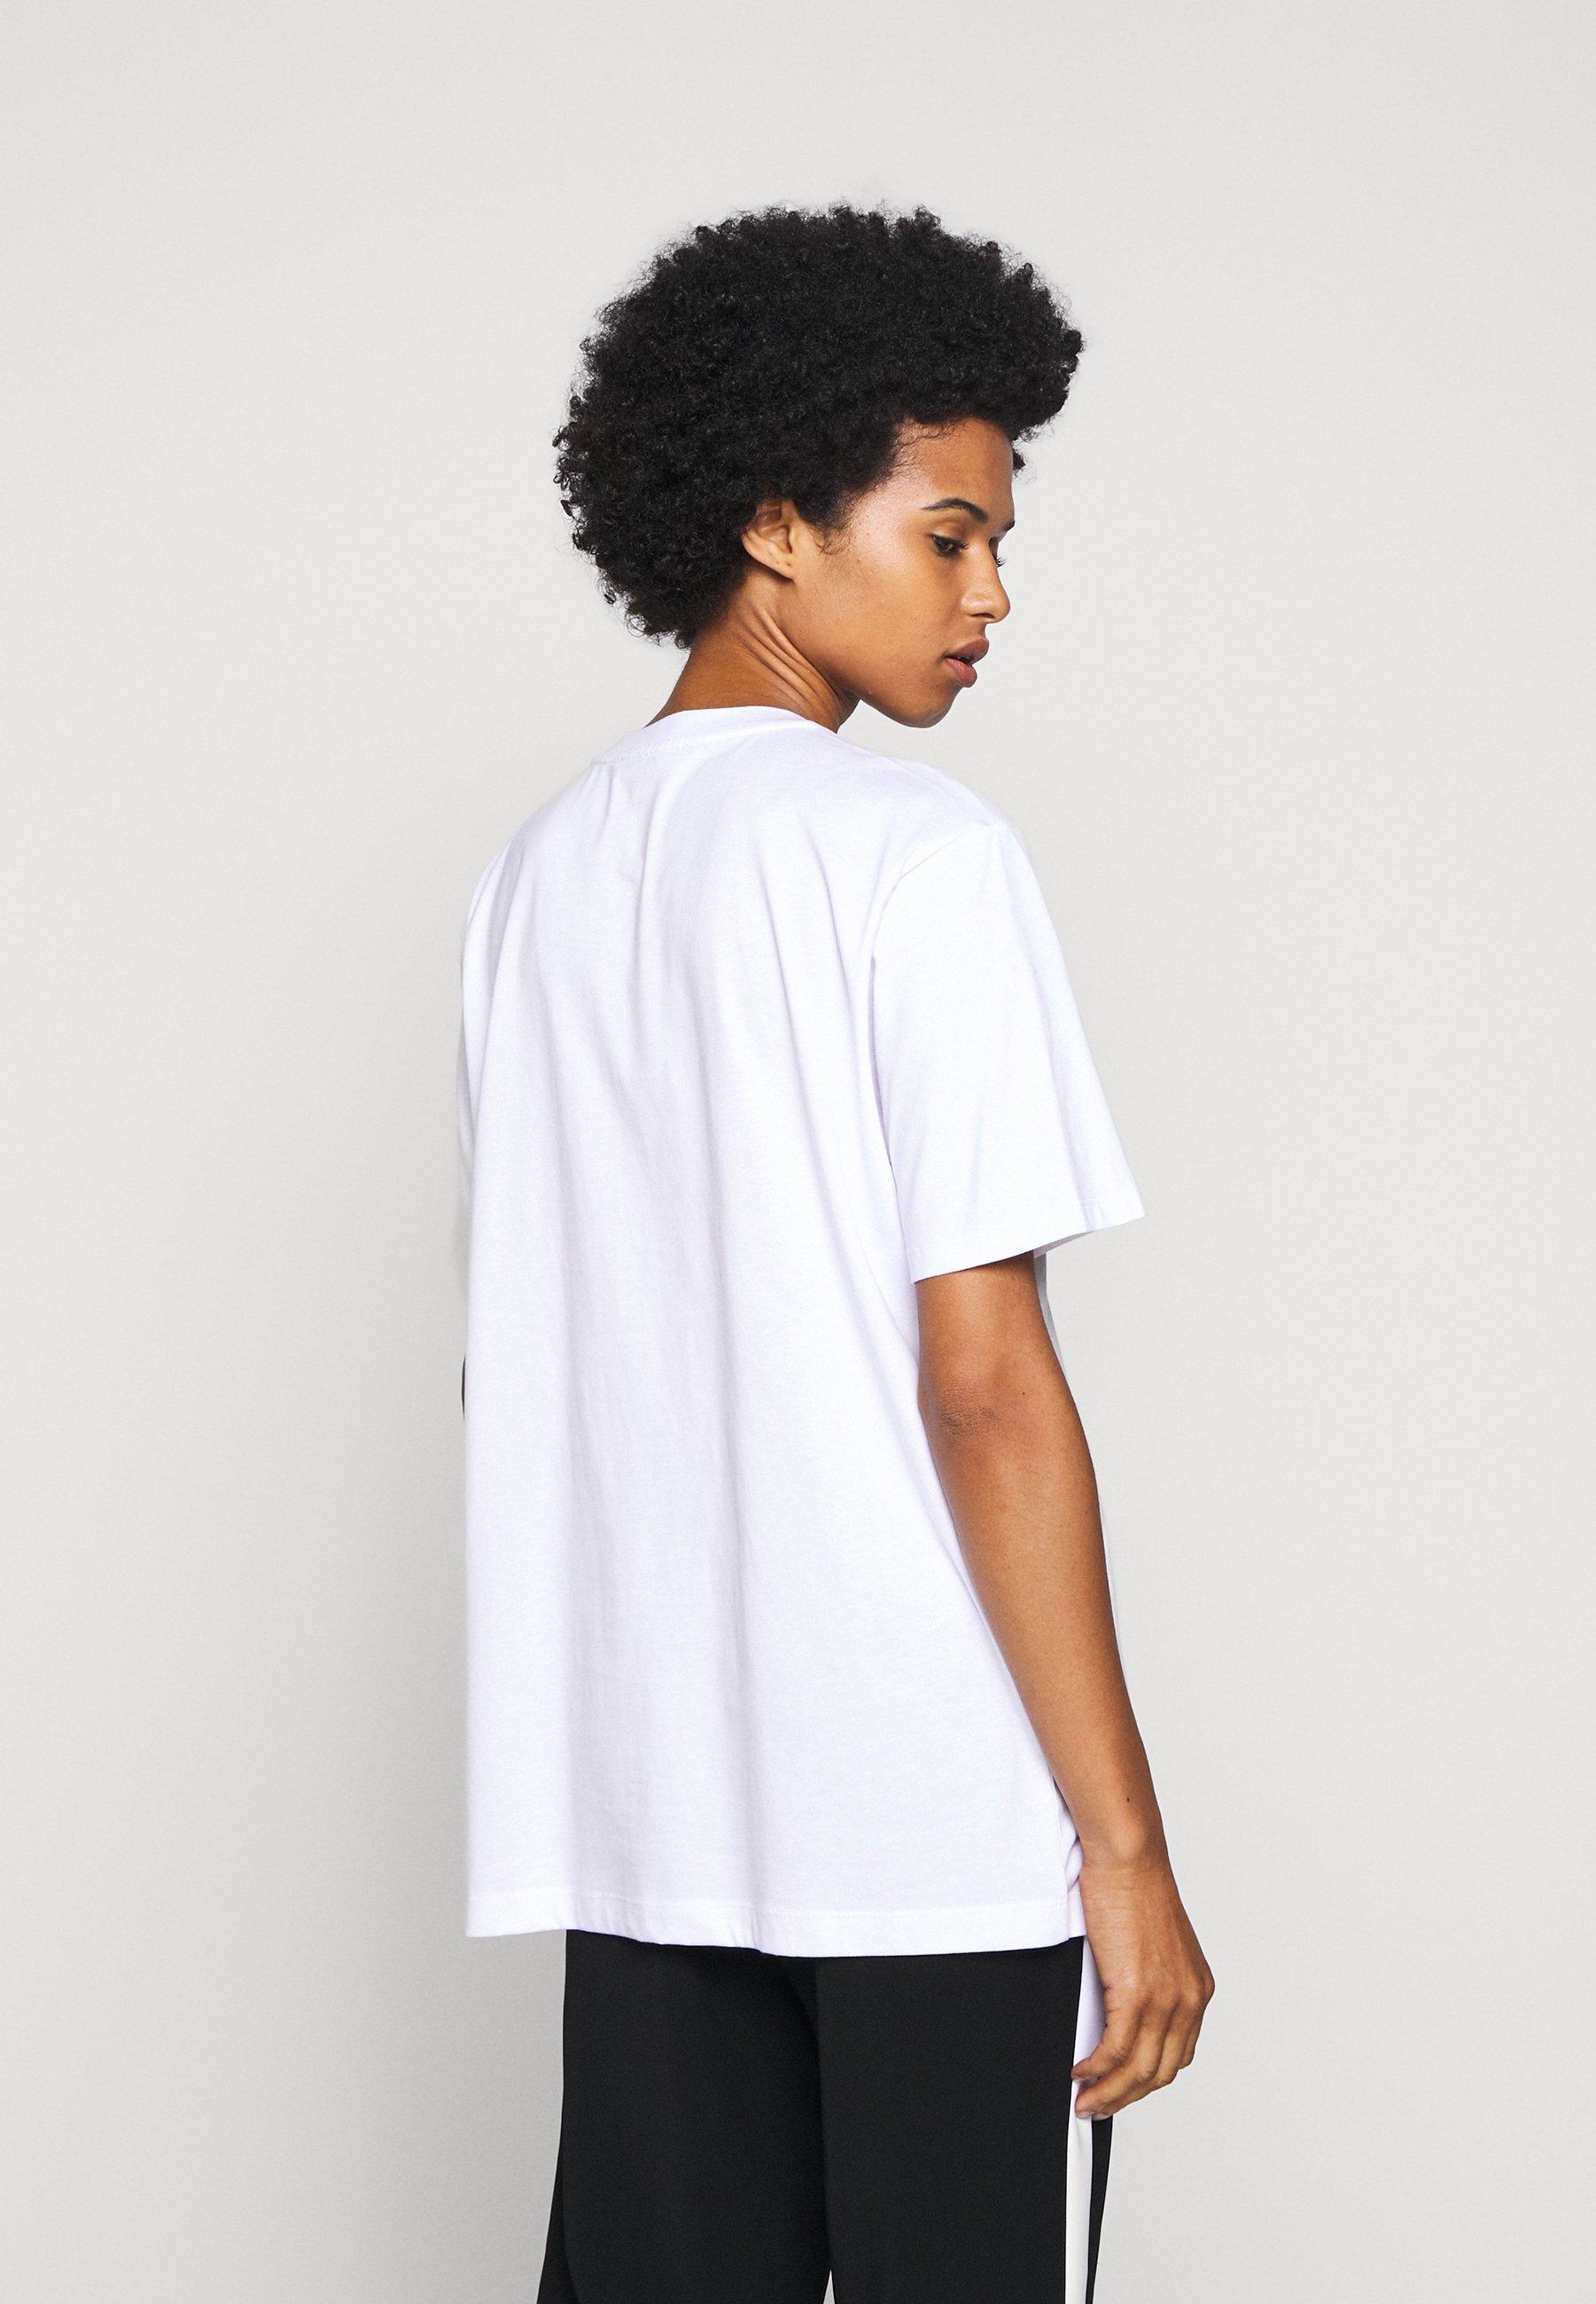 Big Discount Women's Clothing MICHAEL Michael Kors PARIS HEART Print T-shirt white ctL3itZX6